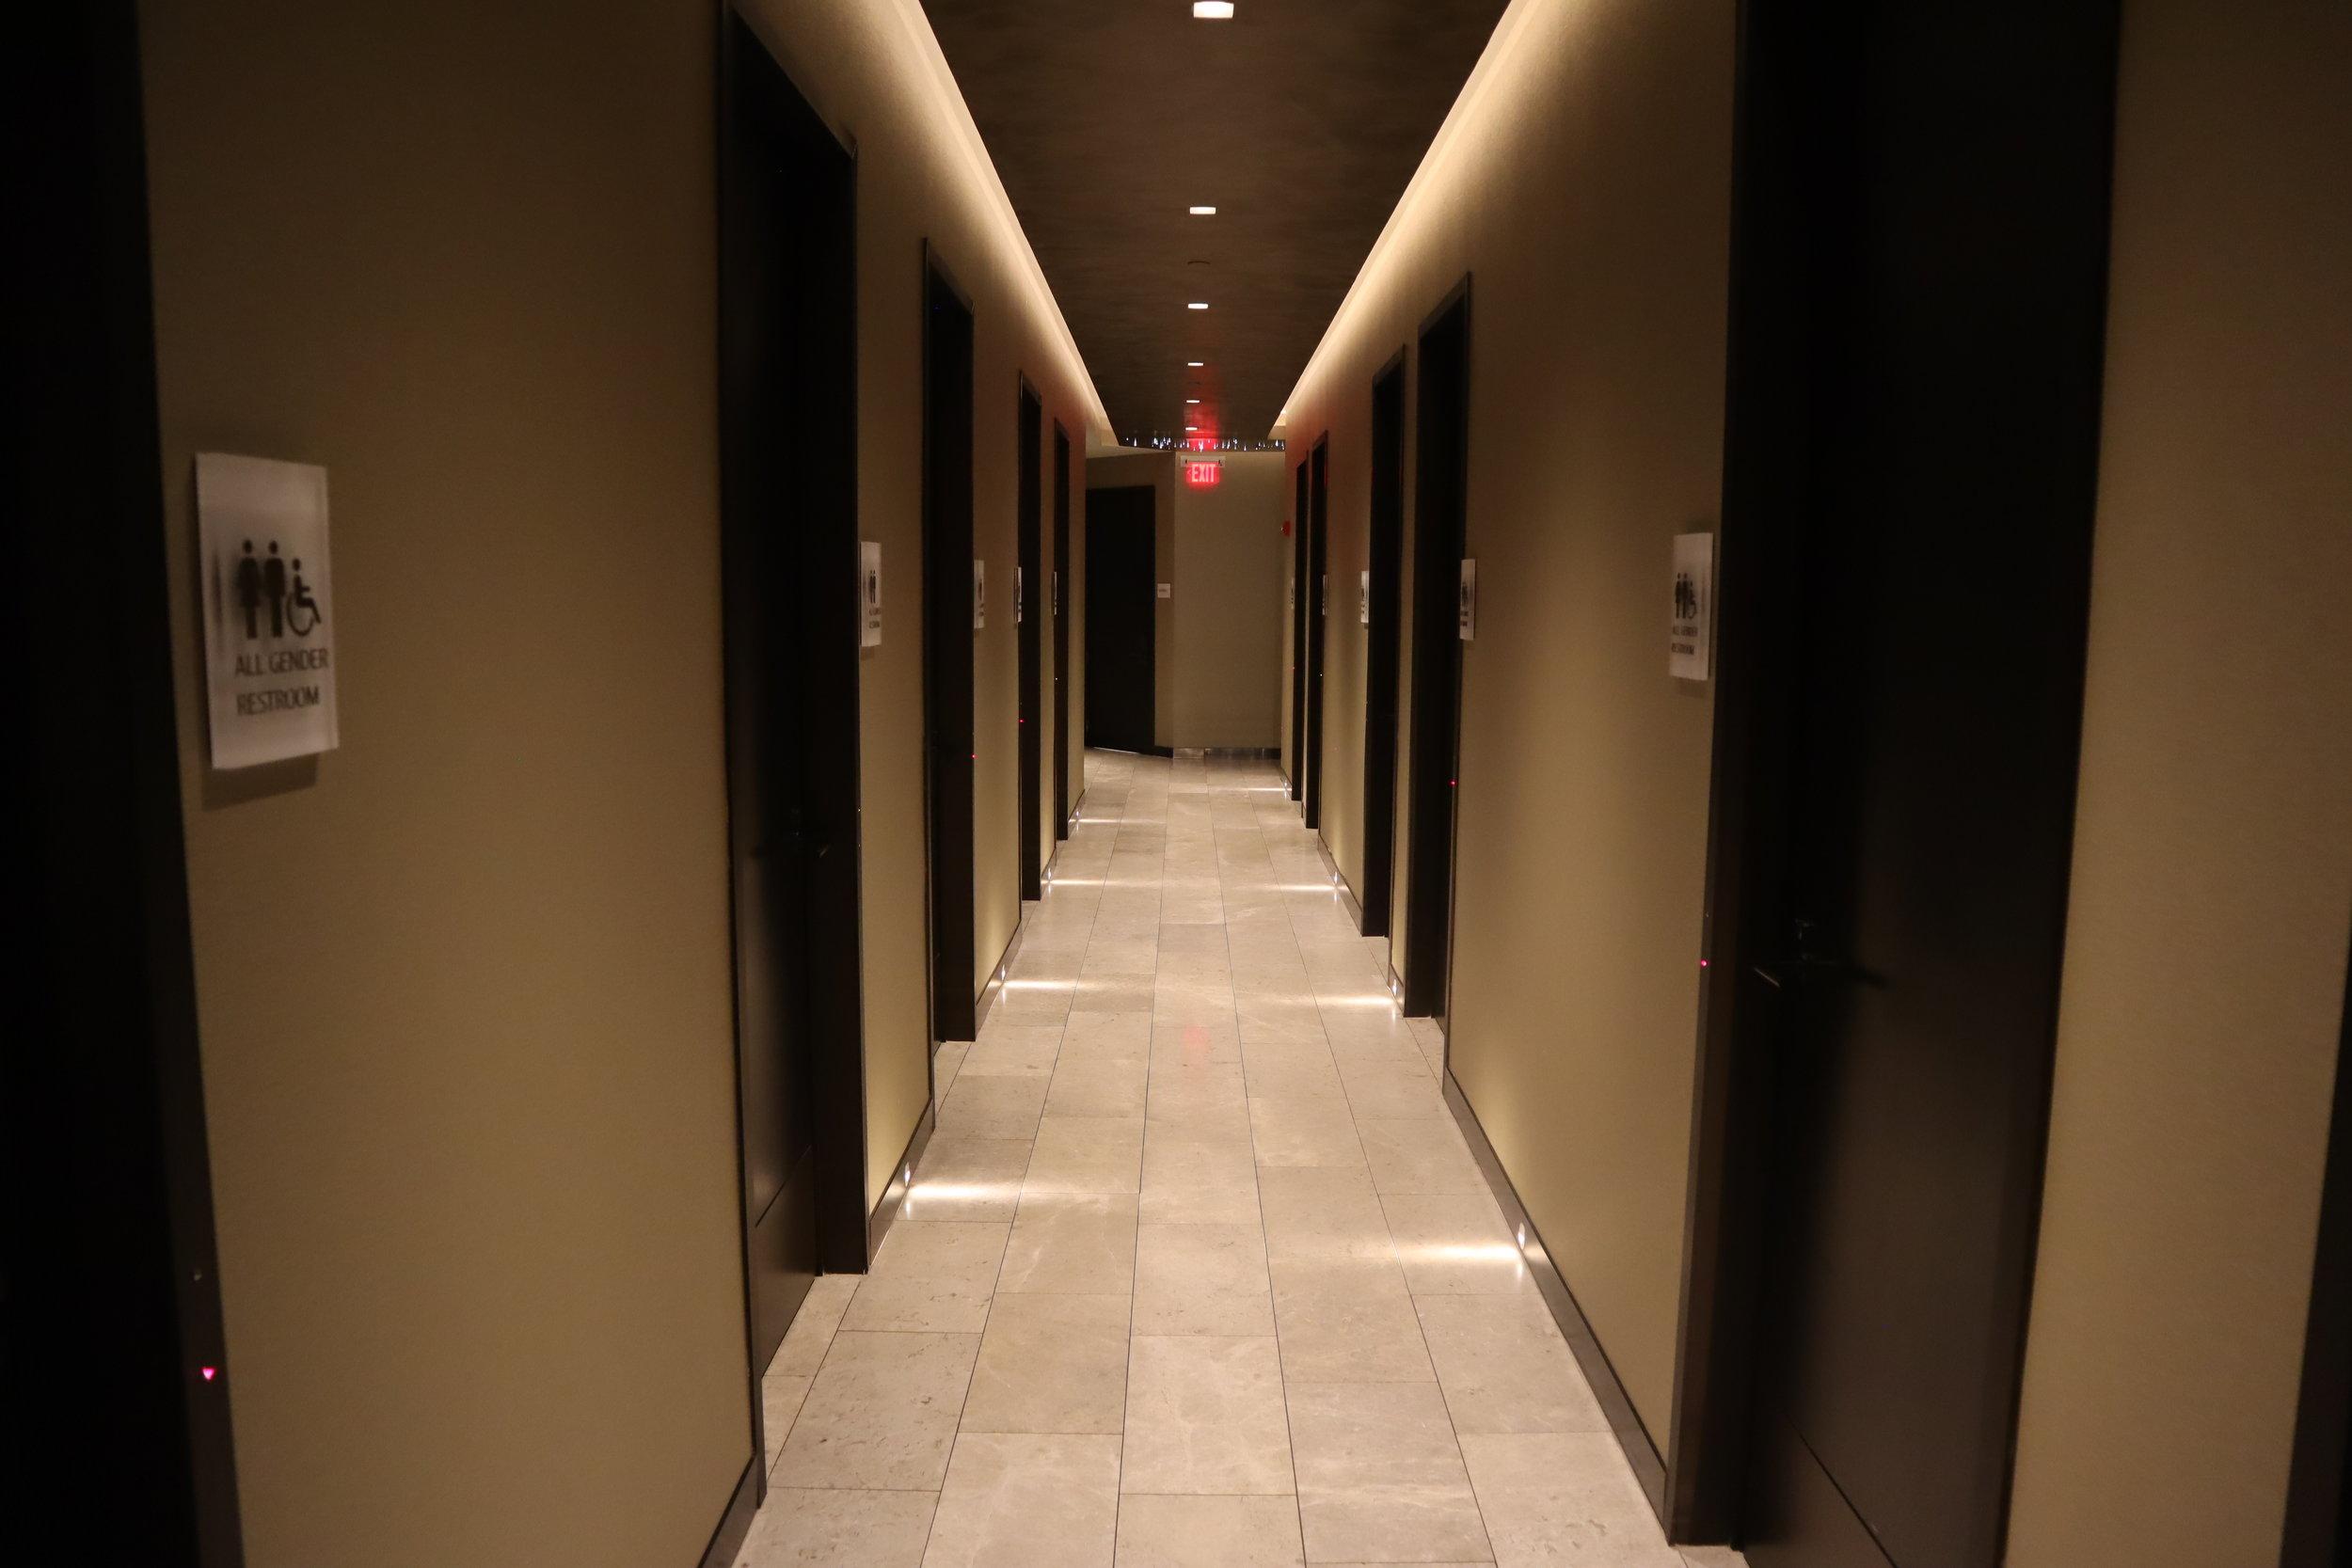 United Polaris Lounge Newark – Bathrooms